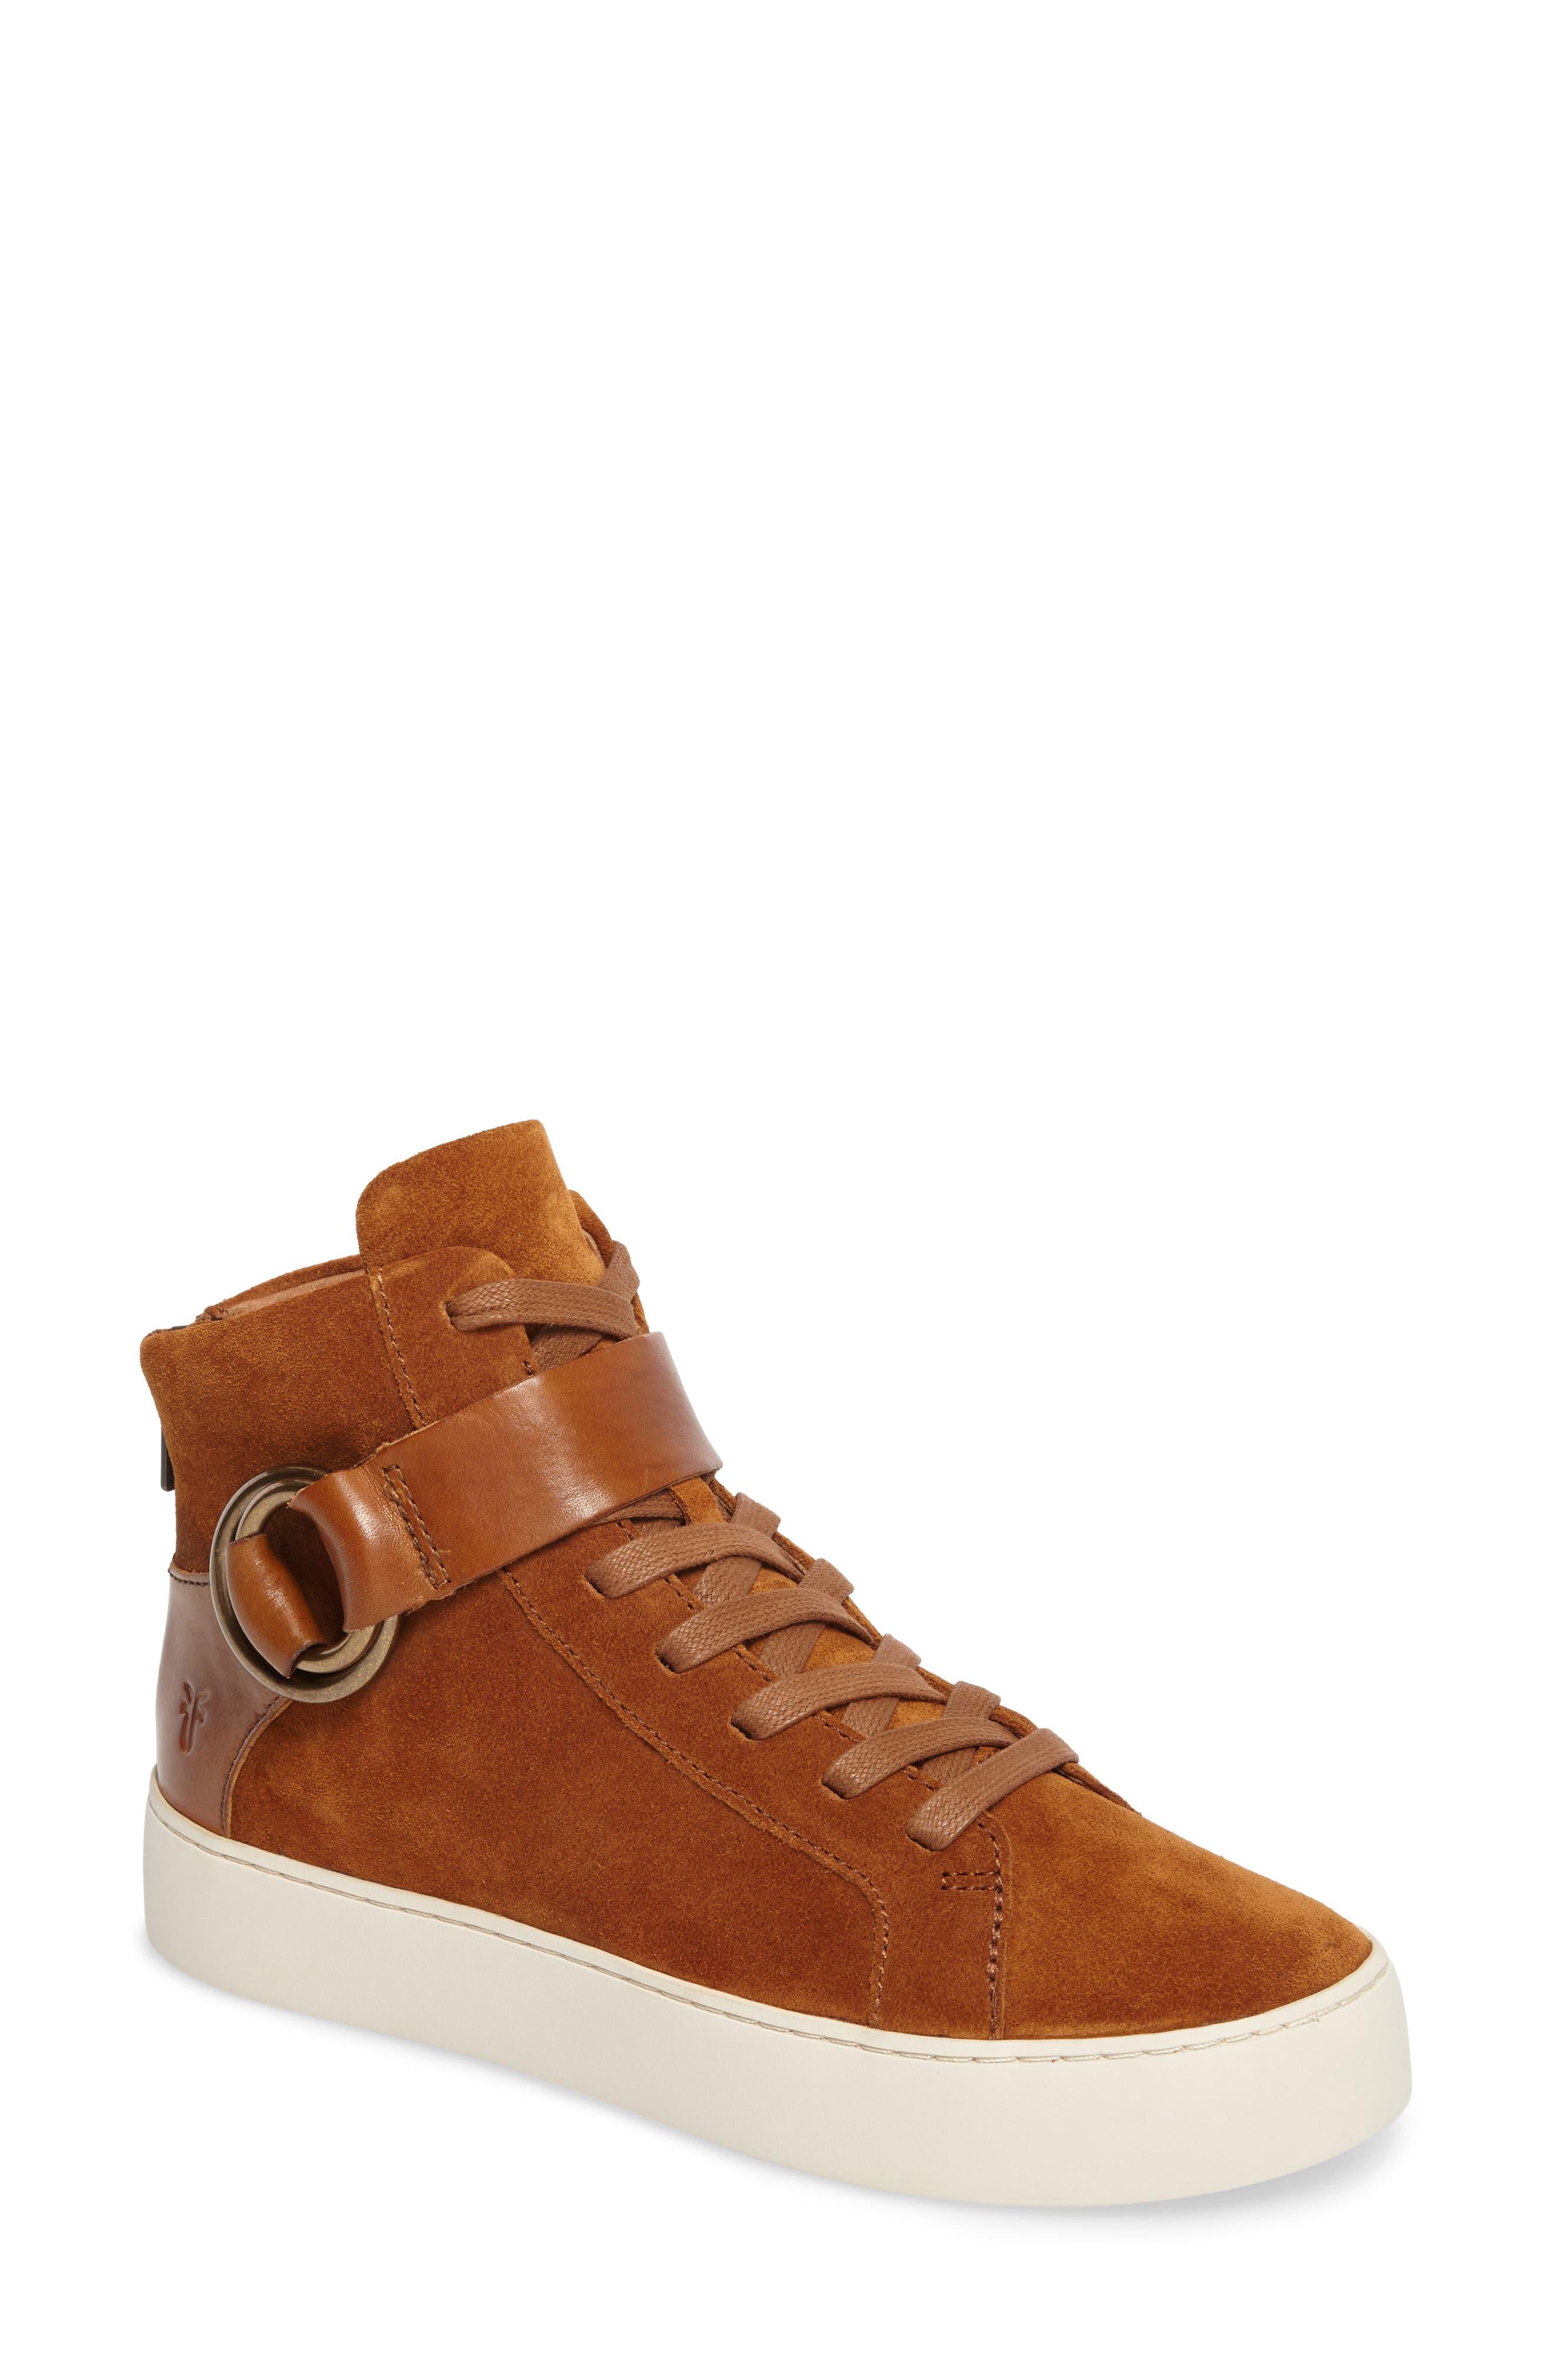 Alternate Image 1 Selected - Frye Lena Harness Sneaker (Women)